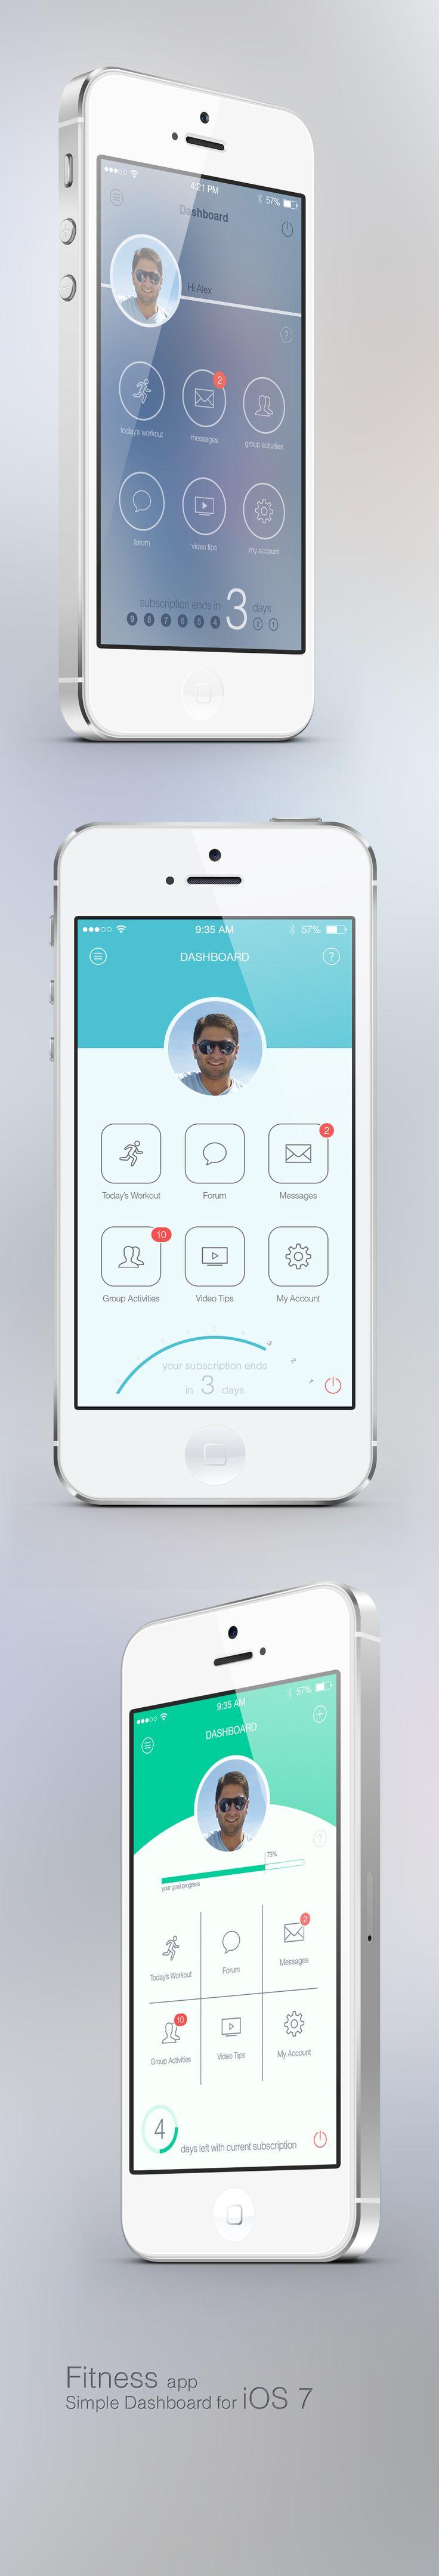 Fitness_app_3_dashboard_screenshots